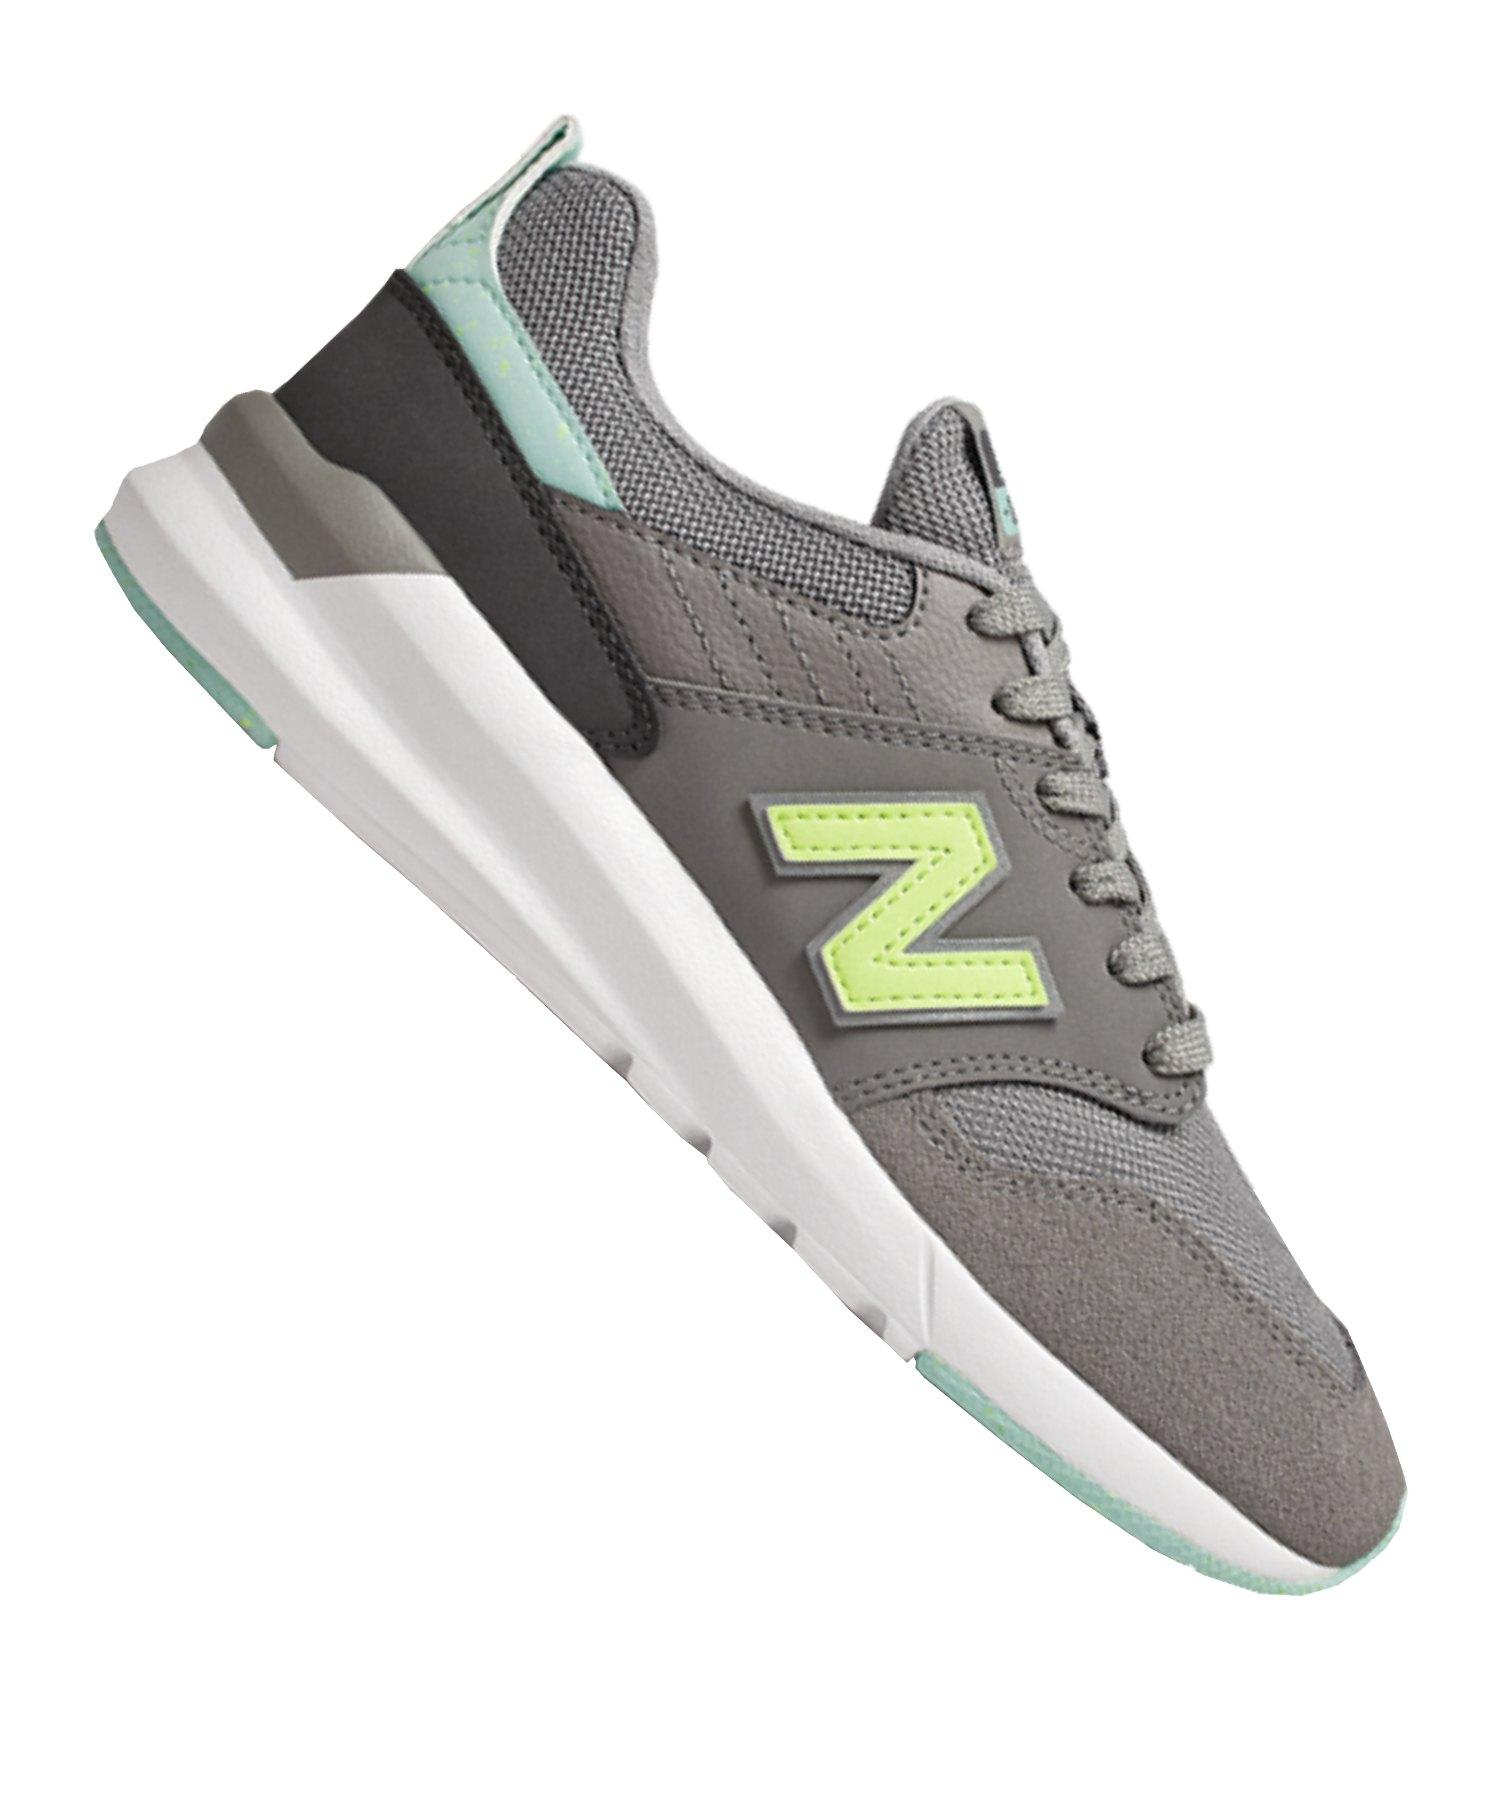 New Balance WS009 B Sneaker Damen Grau F12 - grau